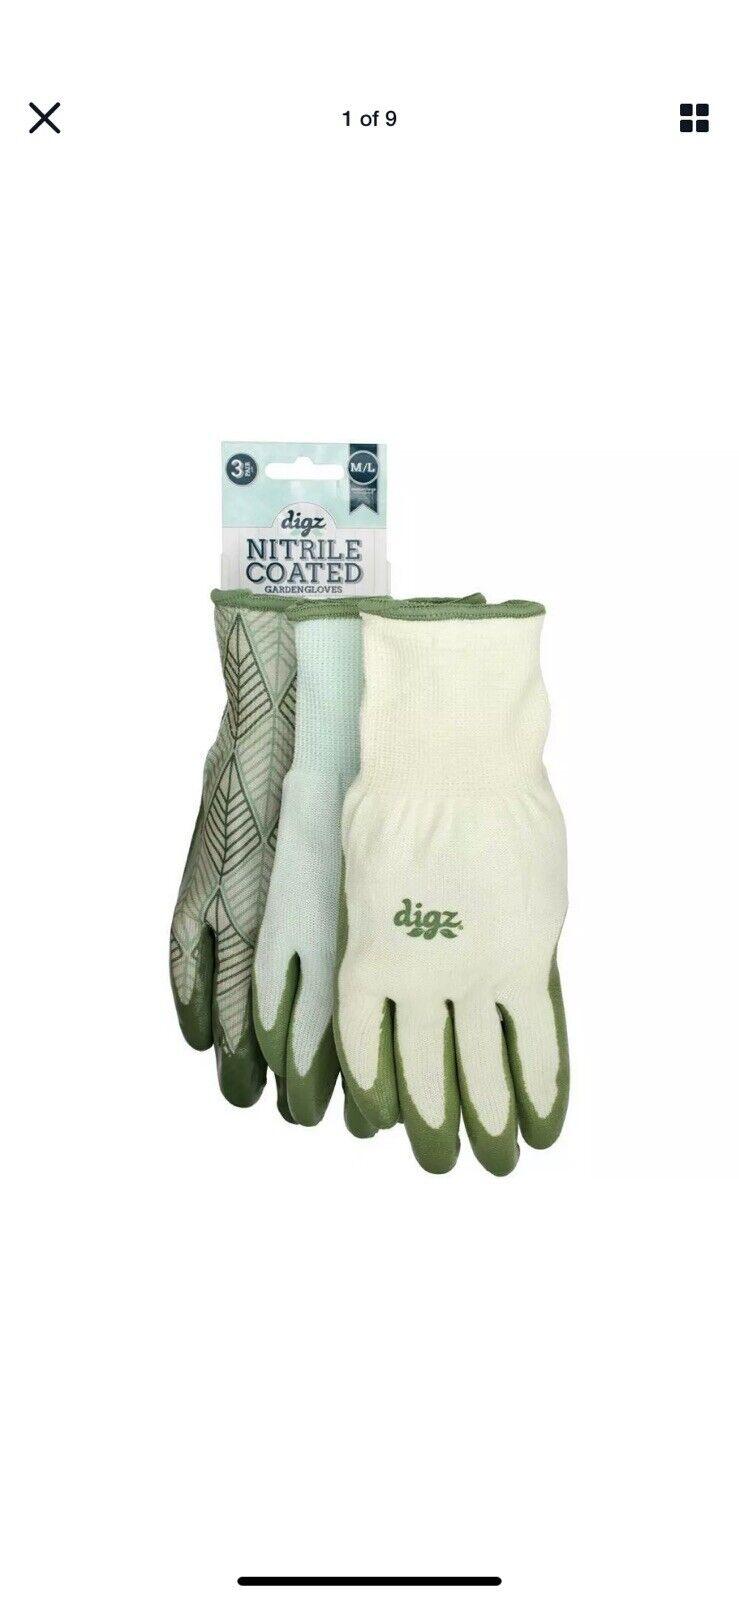 Digz Women's Garden Nitrile Coated Gloves Medium/Large 3-Pairs Latex-free New 2